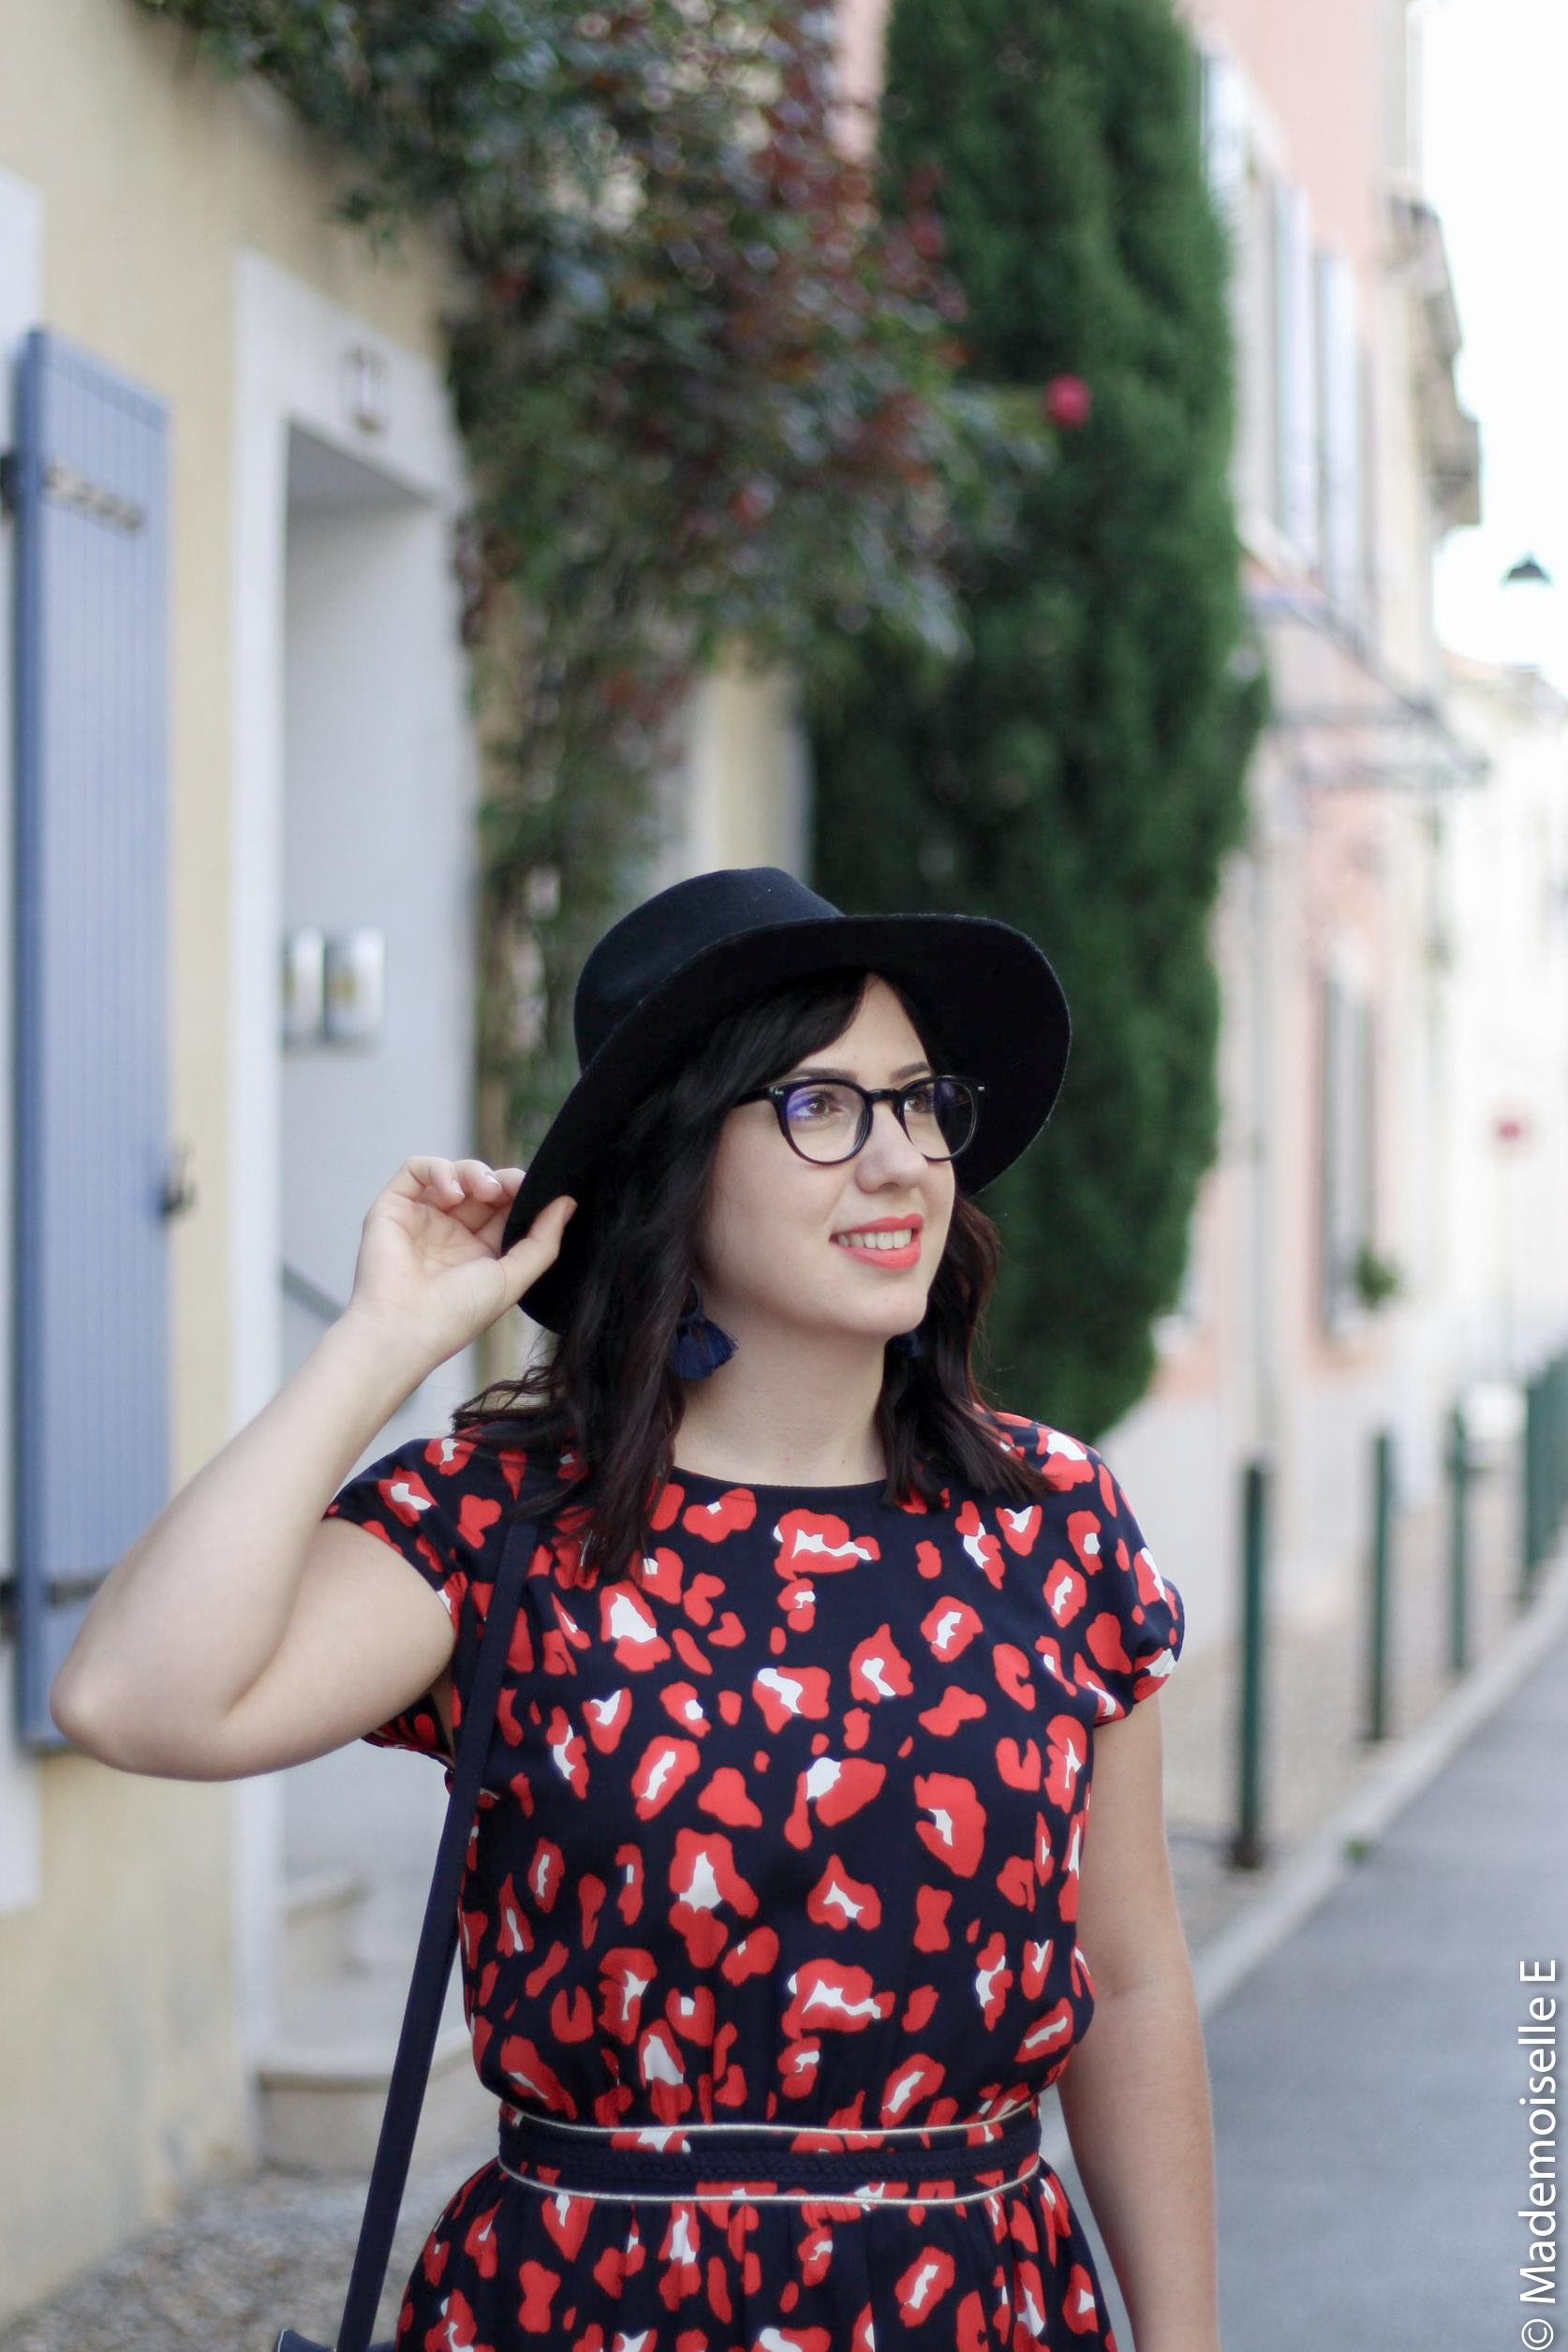 robe leopard tendance 2018 3 mademoiselle-e